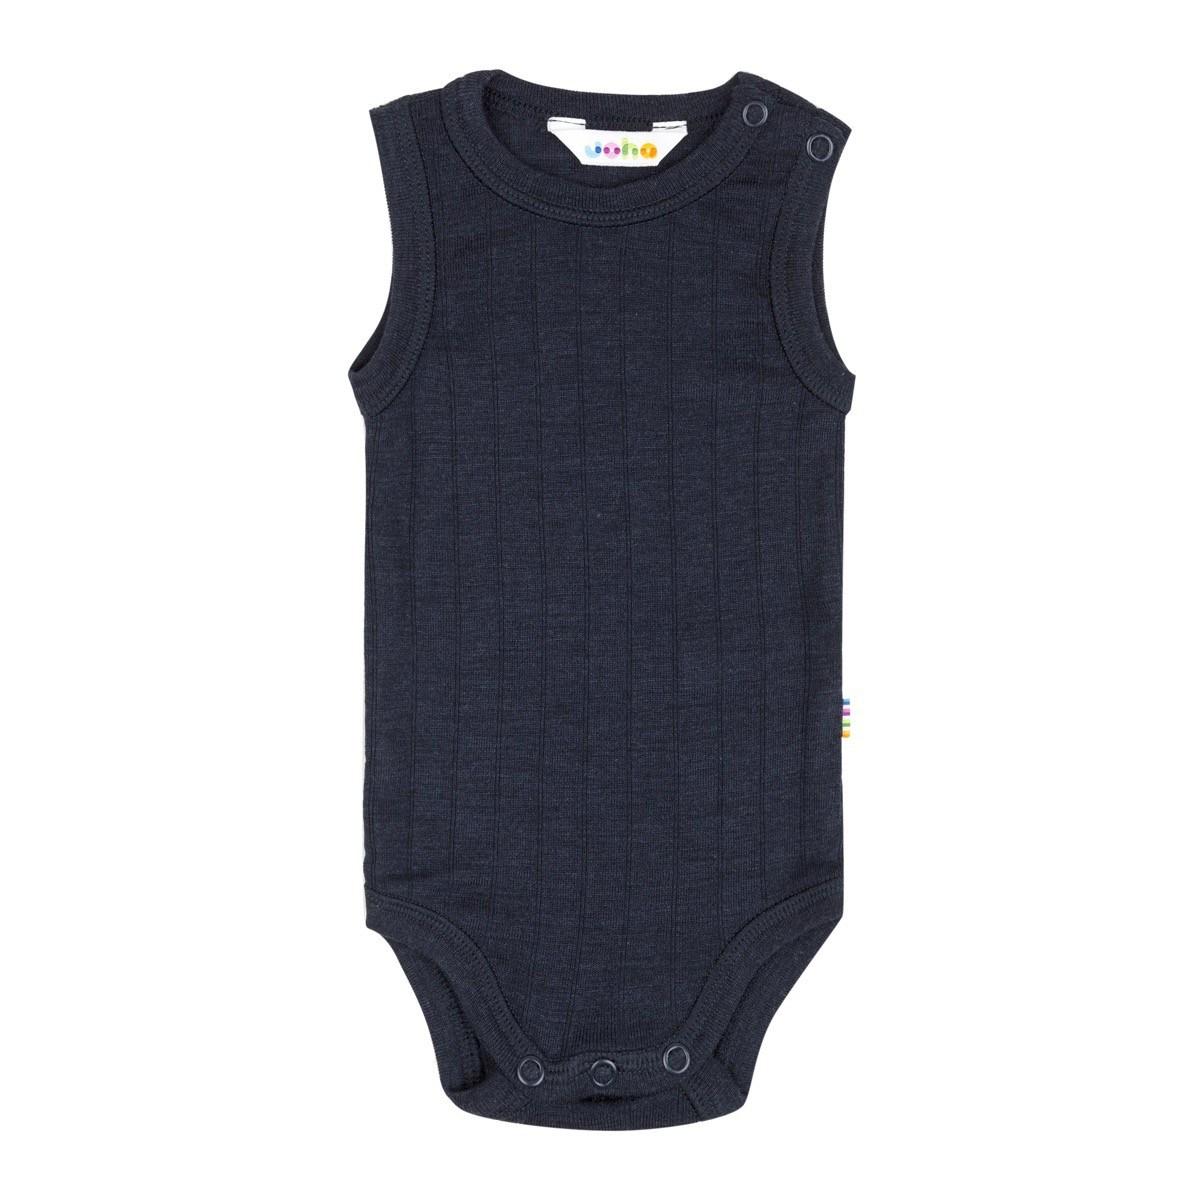 3c409192 Body uden ærmer i blød uld/silke blanding - Marineblå. Joha